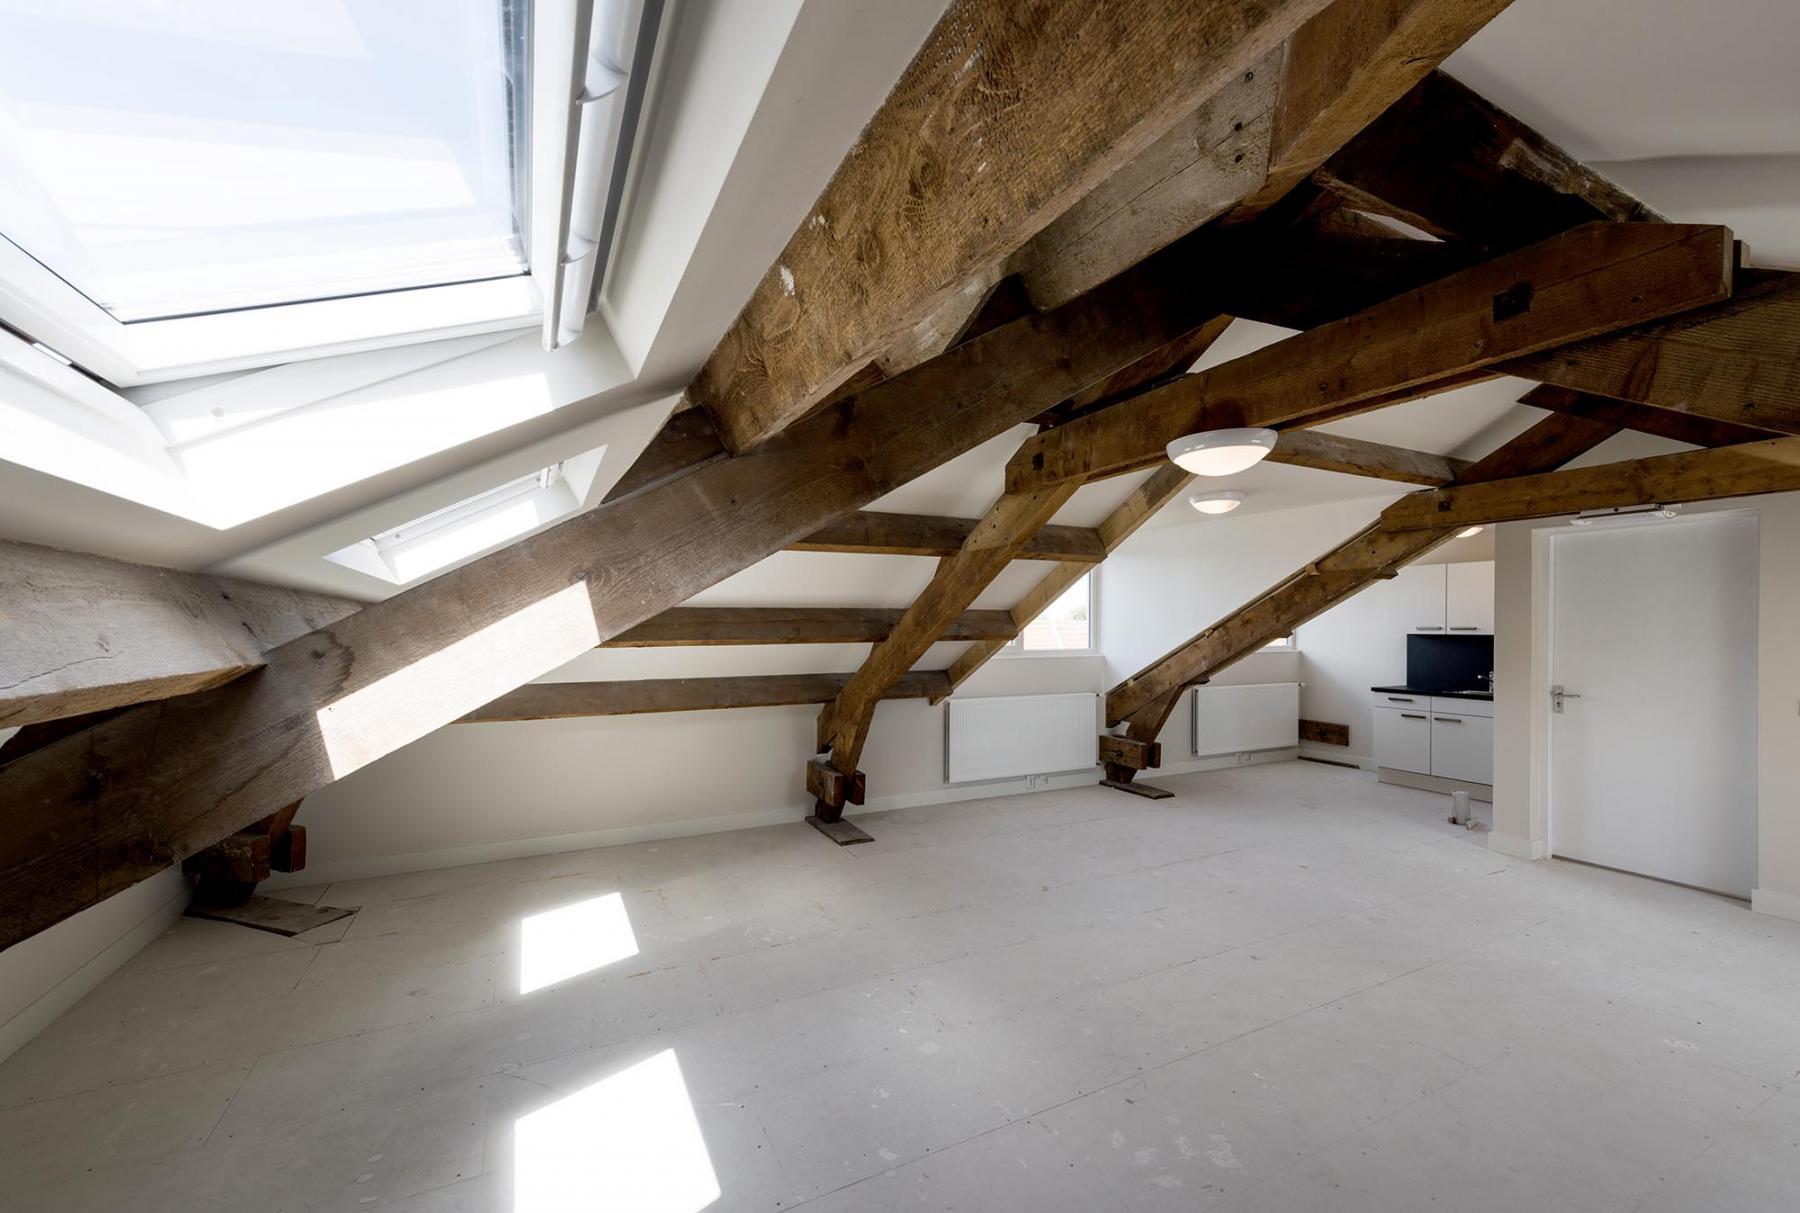 kantoorpand hout balken kantoorruimte